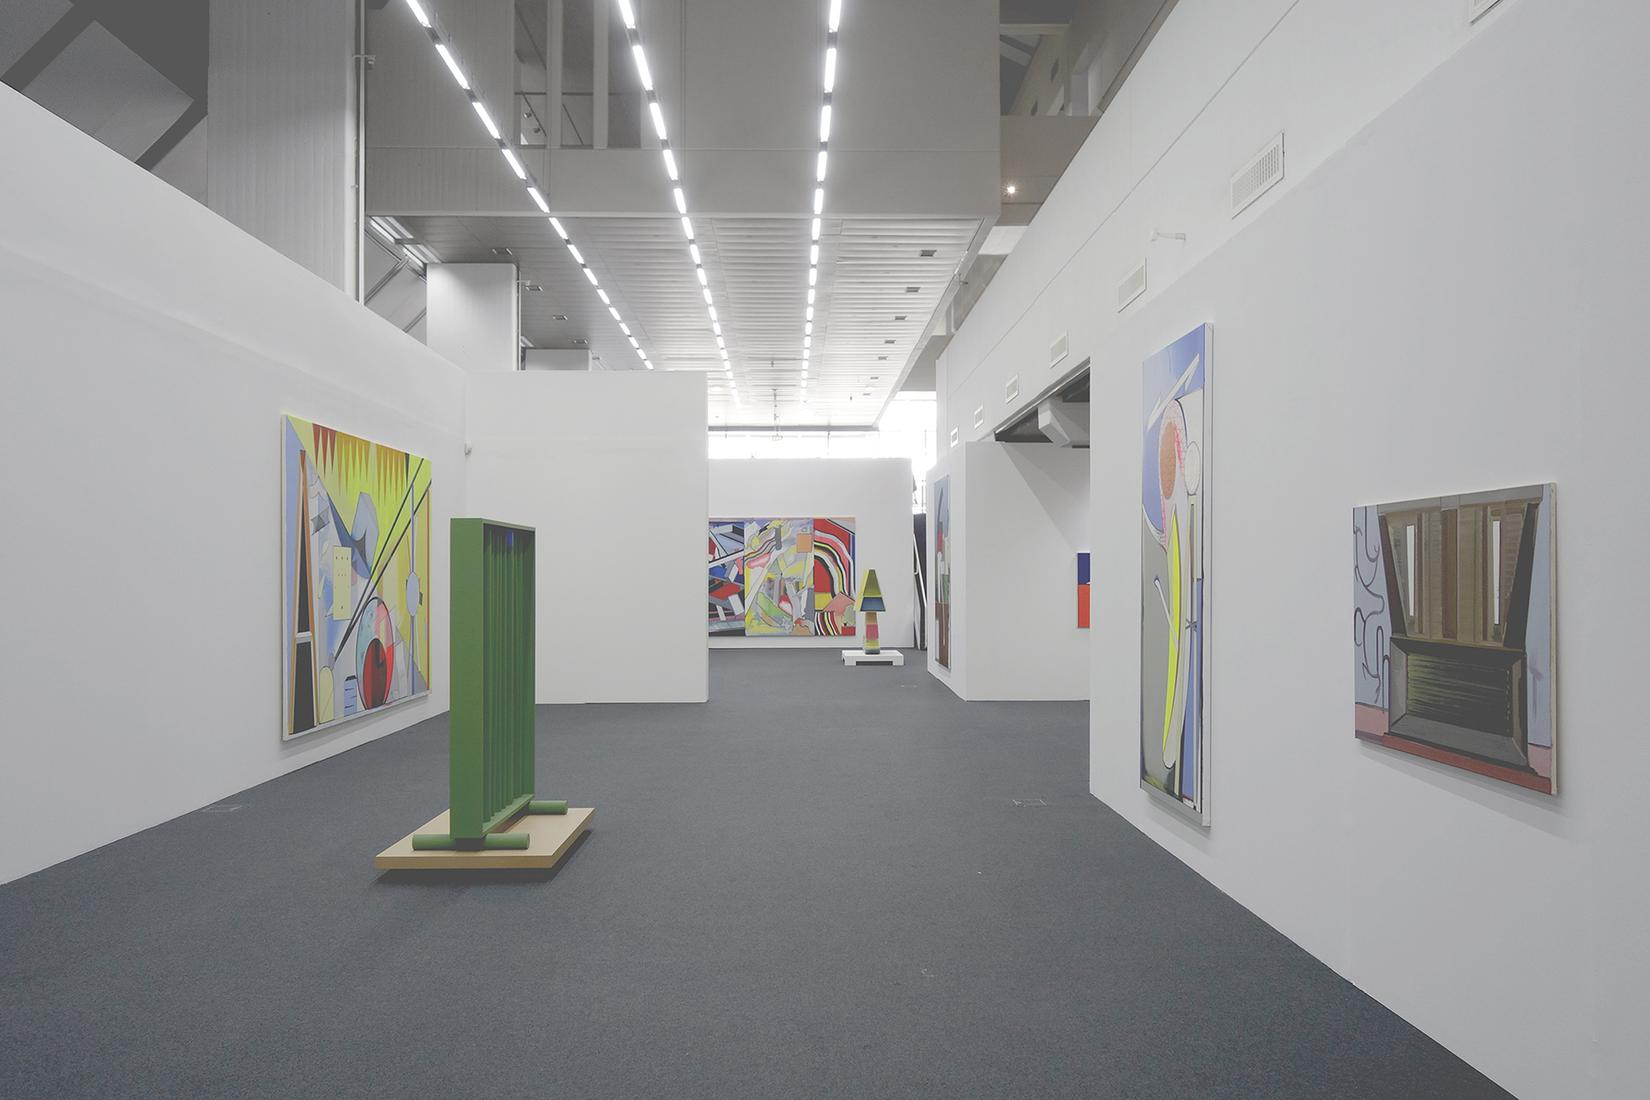 May 19 - August 12, 2018 - Wilhelmhack Museum,  Ludwigshafen, Germany - Thomas Scheibitz - Masterplan \ kino -  - Exhibitions